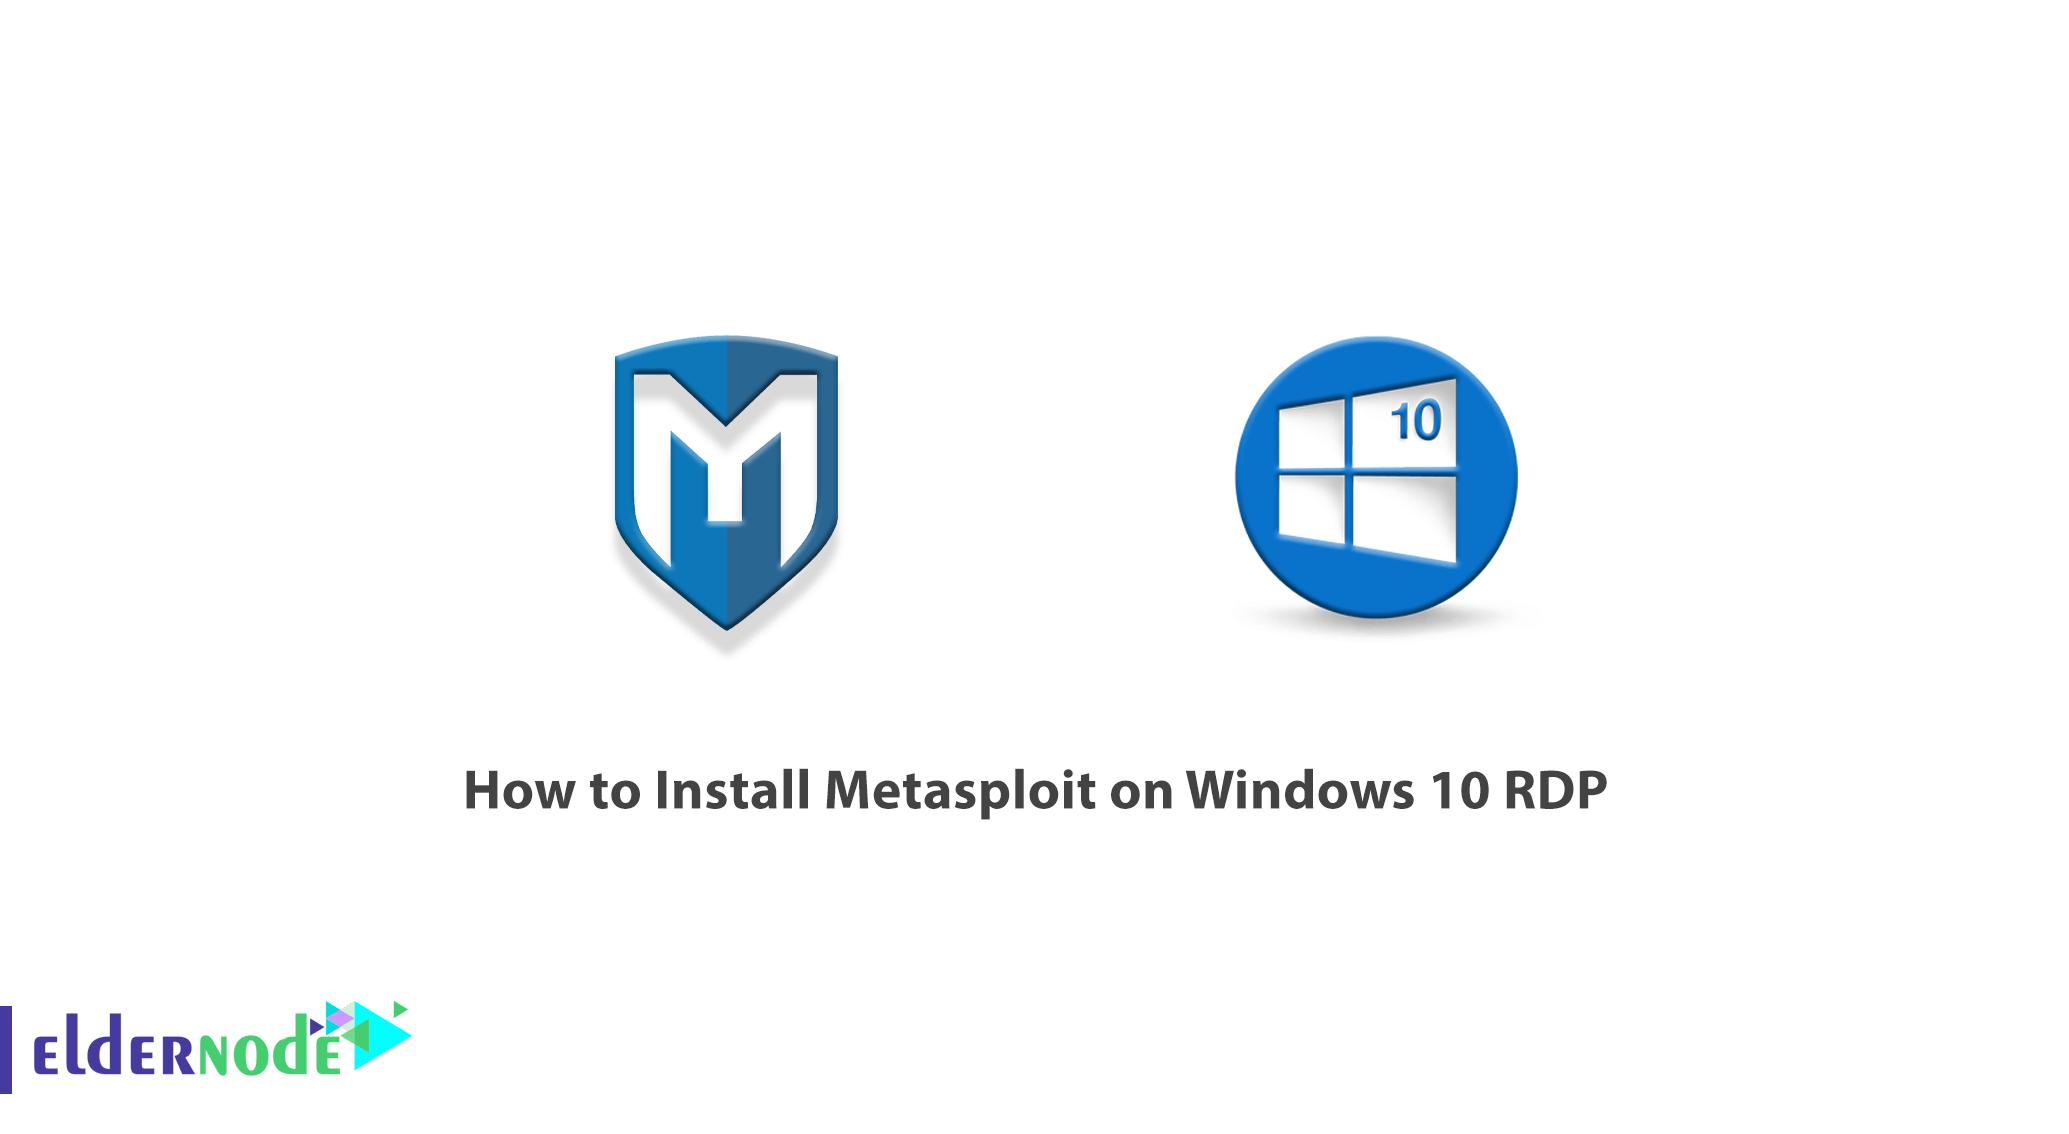 How to Install Metasploit on Windows 10 RDP